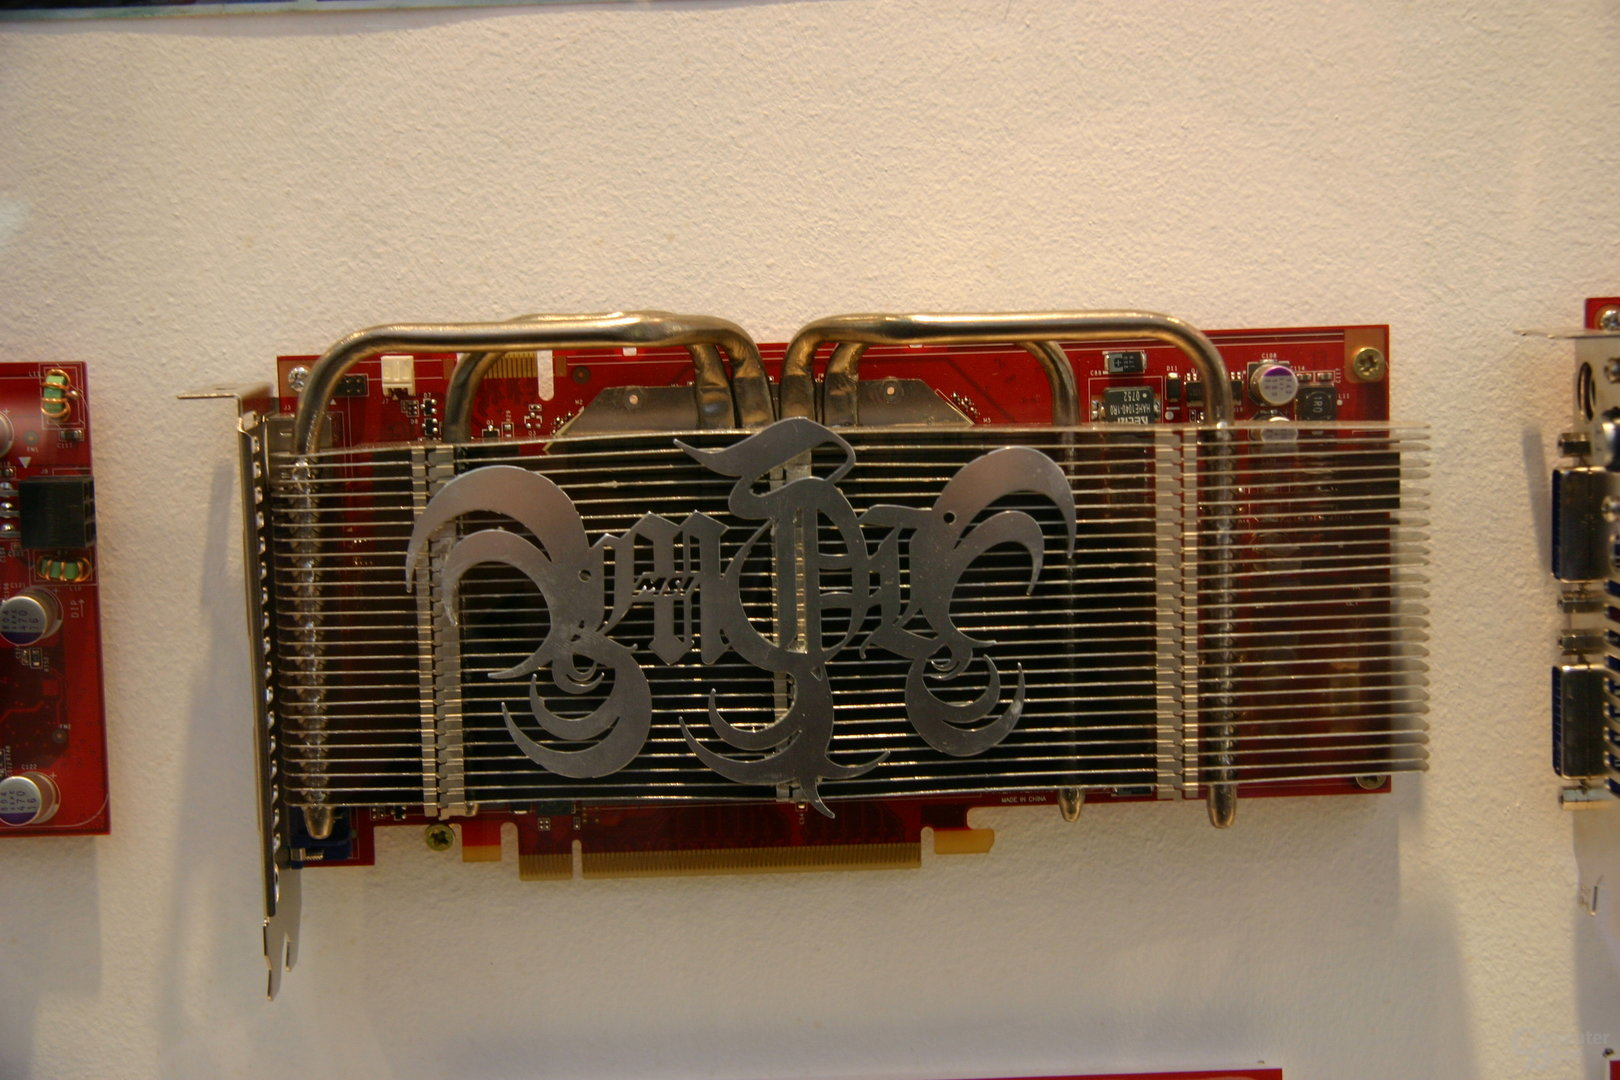 Nvidia GeForce 9600 GT